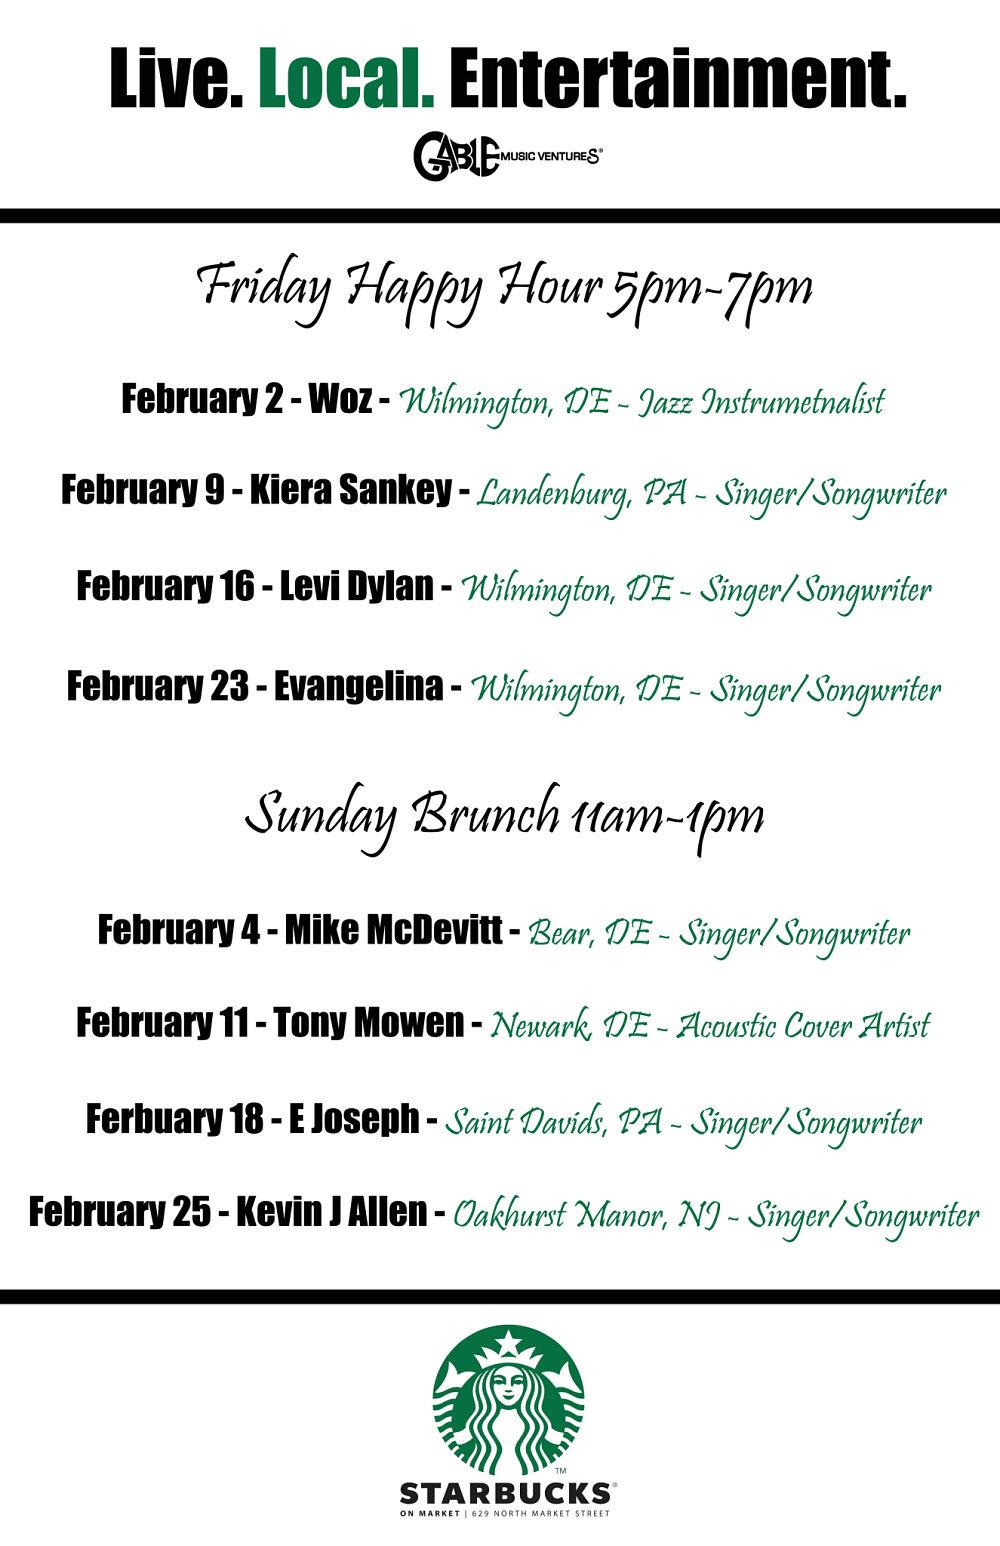 Starbucks Monthly Schedule February 2018_opt